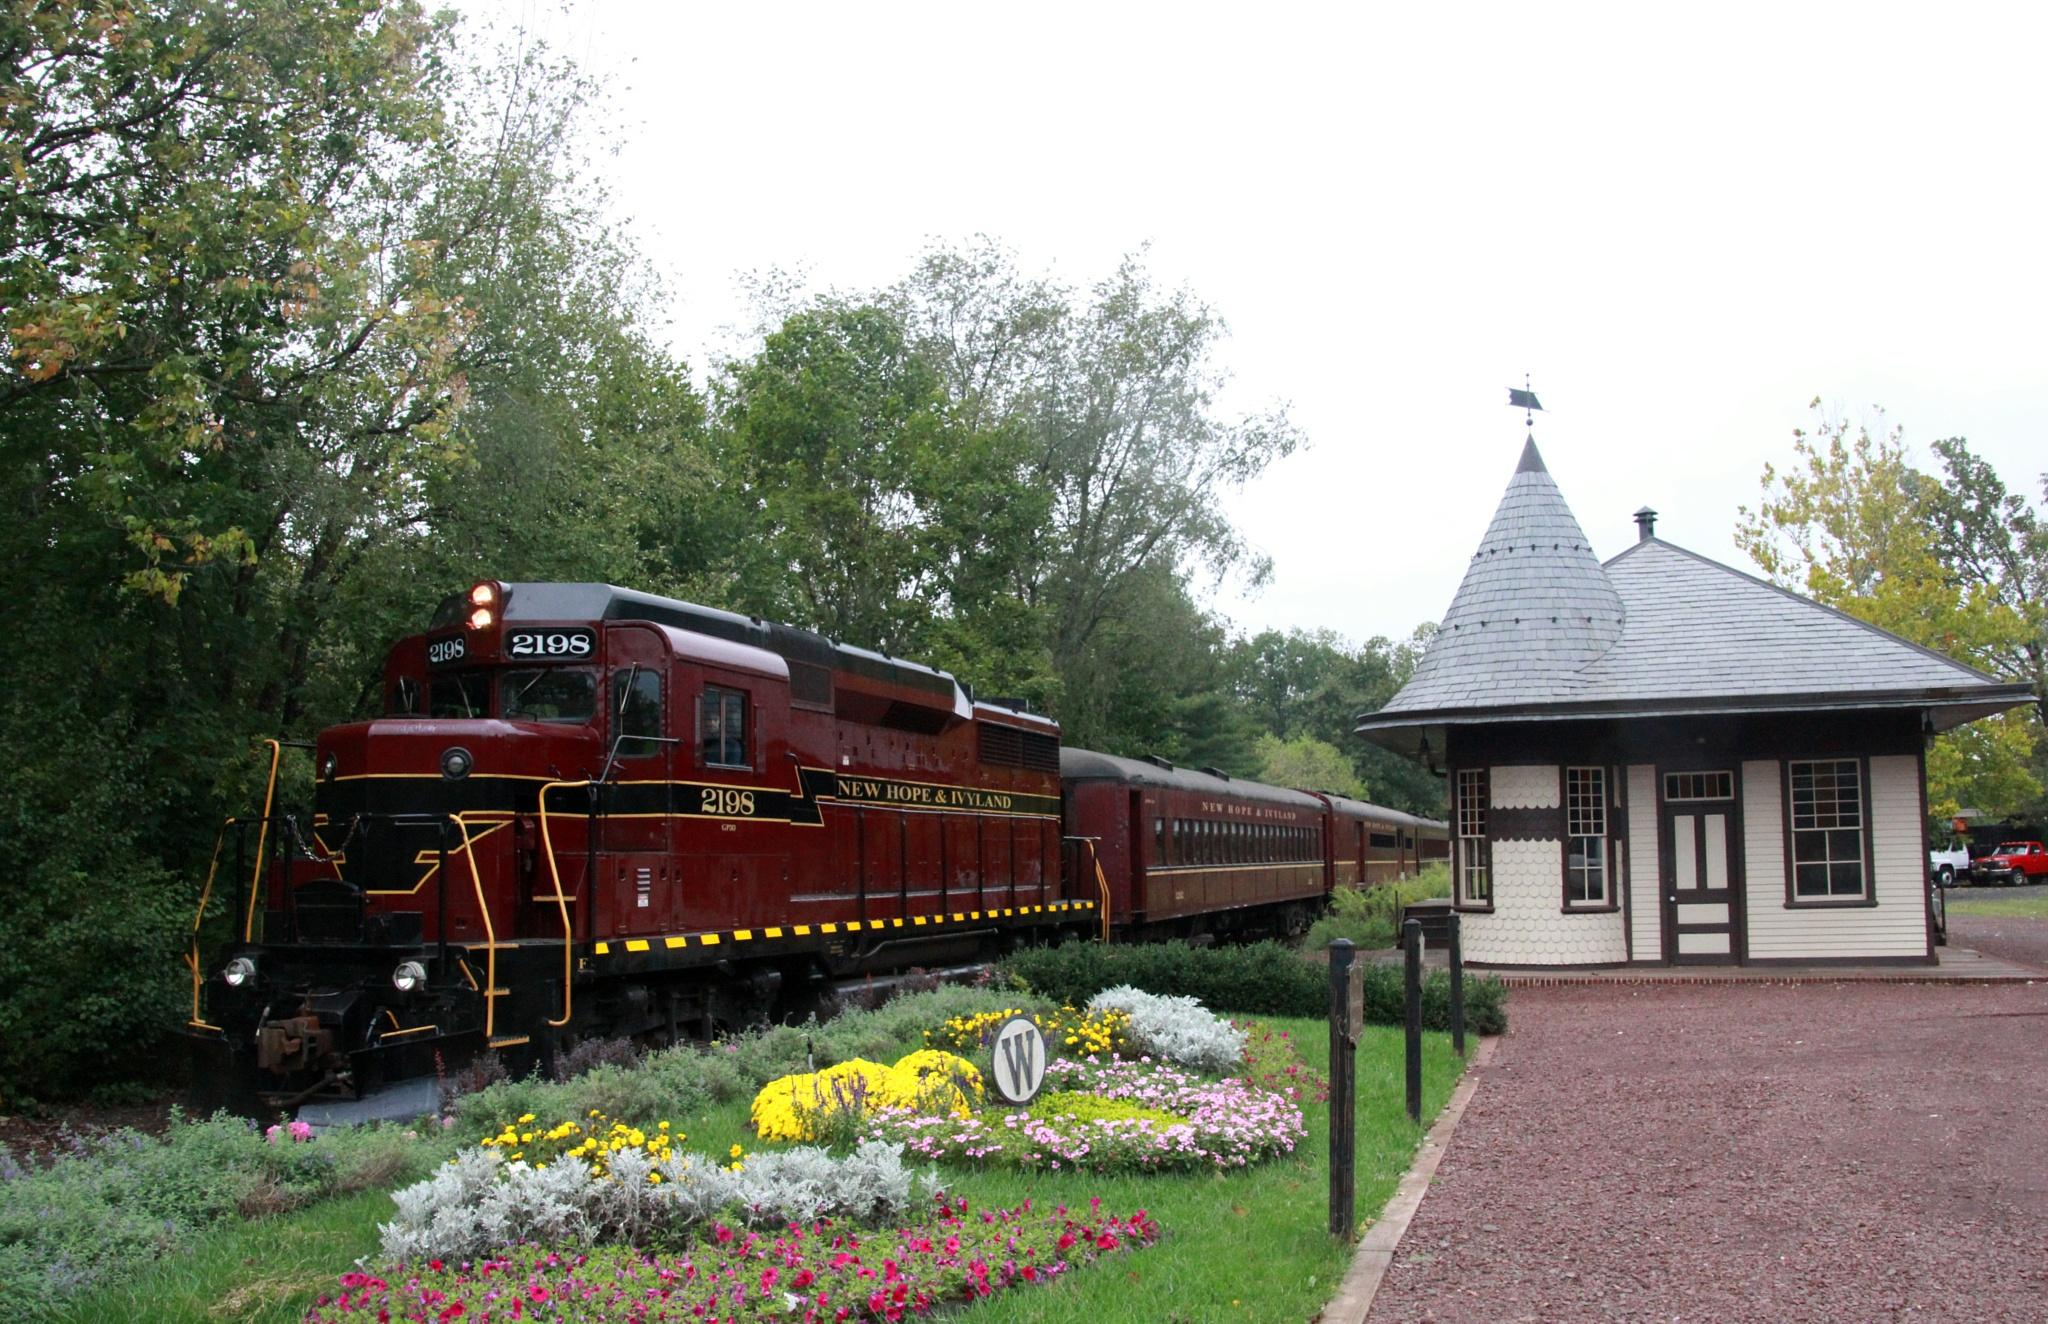 New Hope Train by brandleya